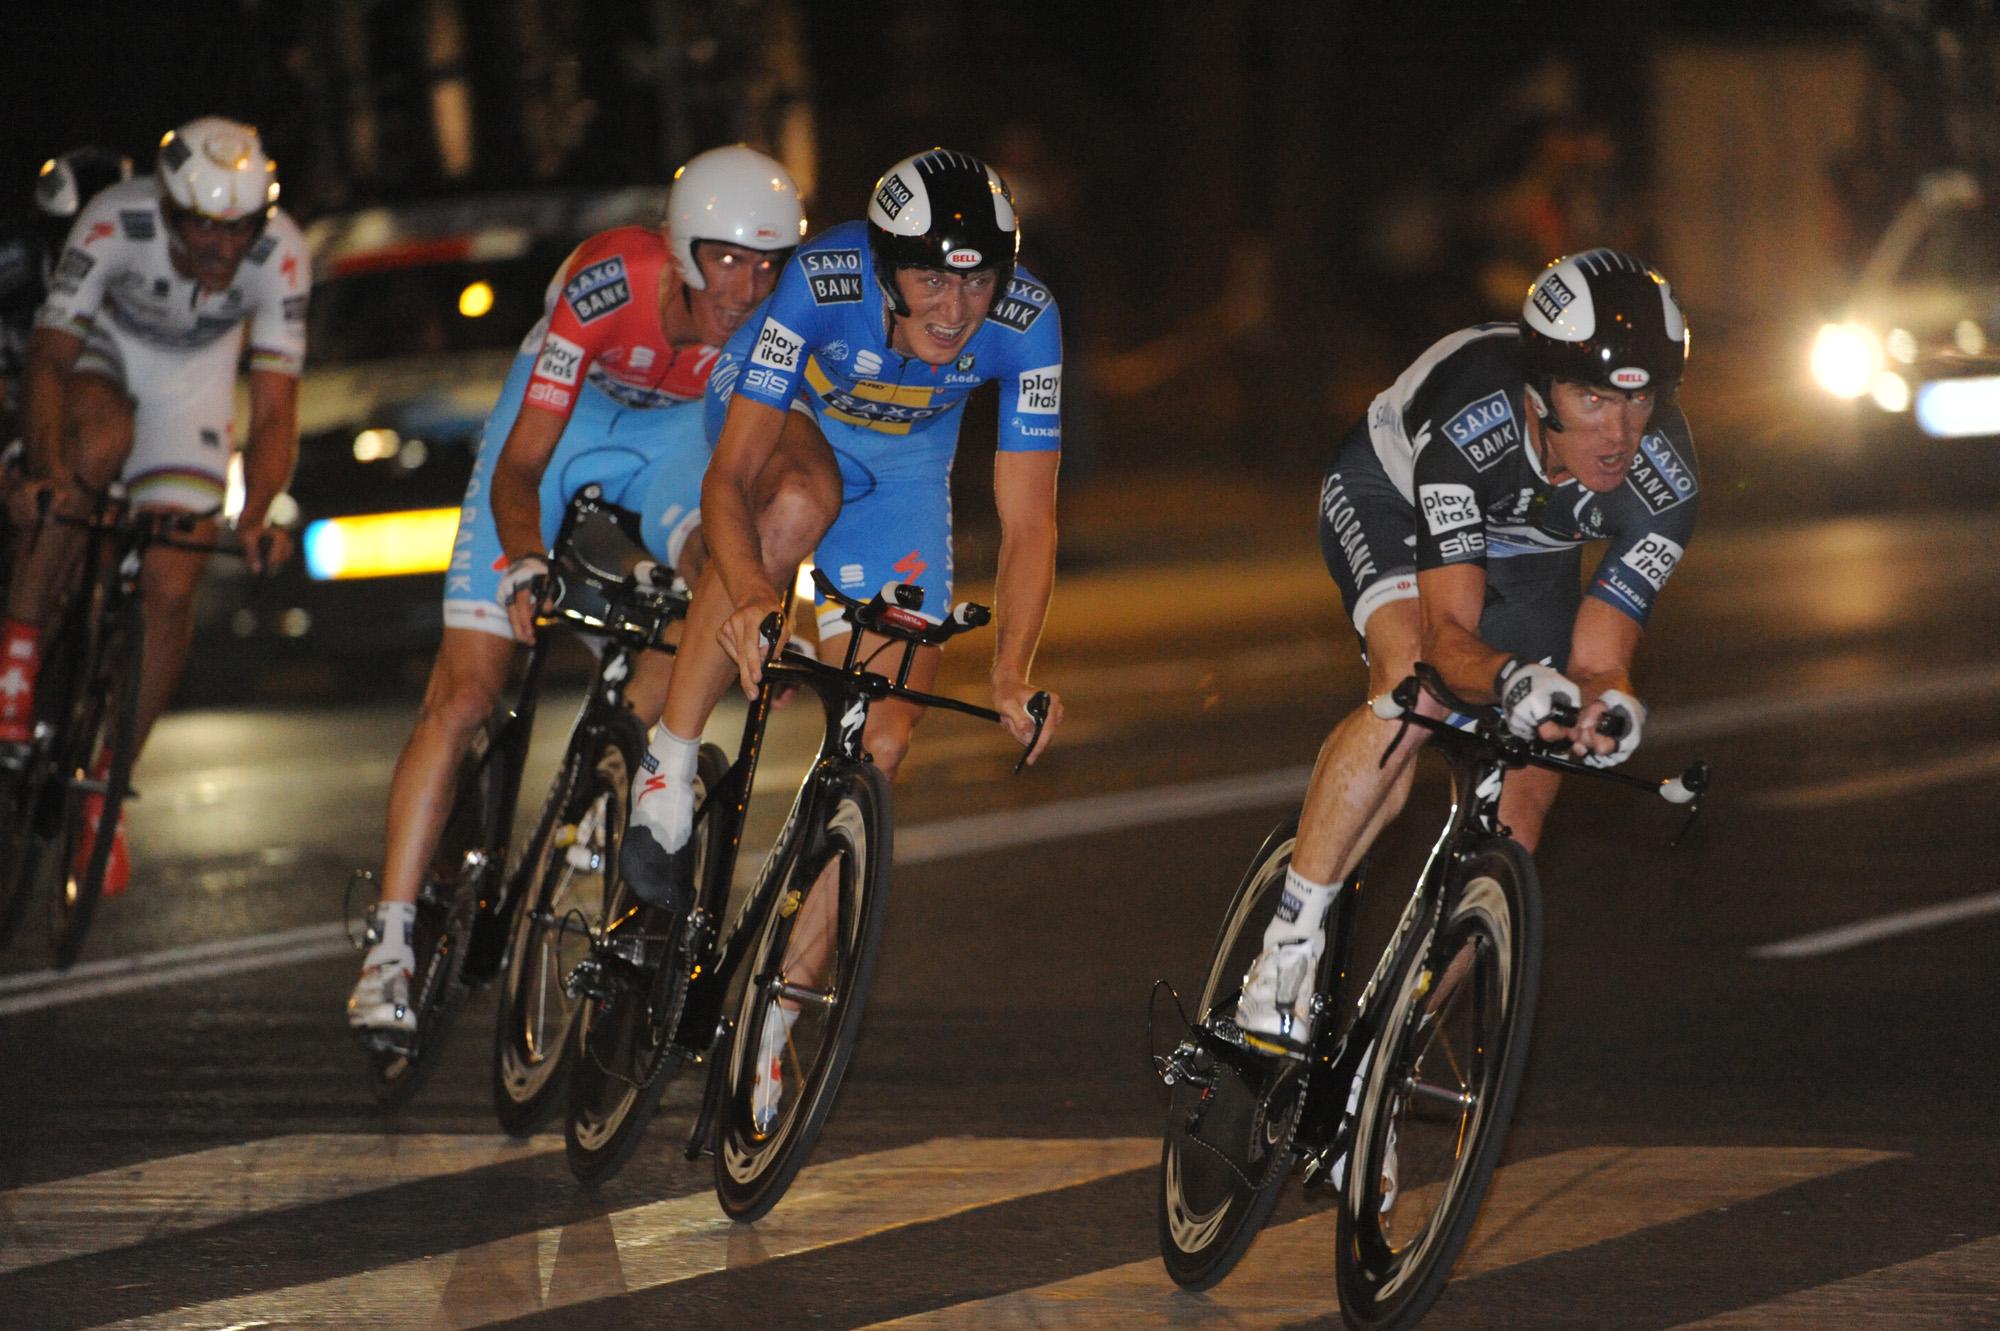 Saxo Bank, Vuelta a Espana 2010 stage 1 TTT